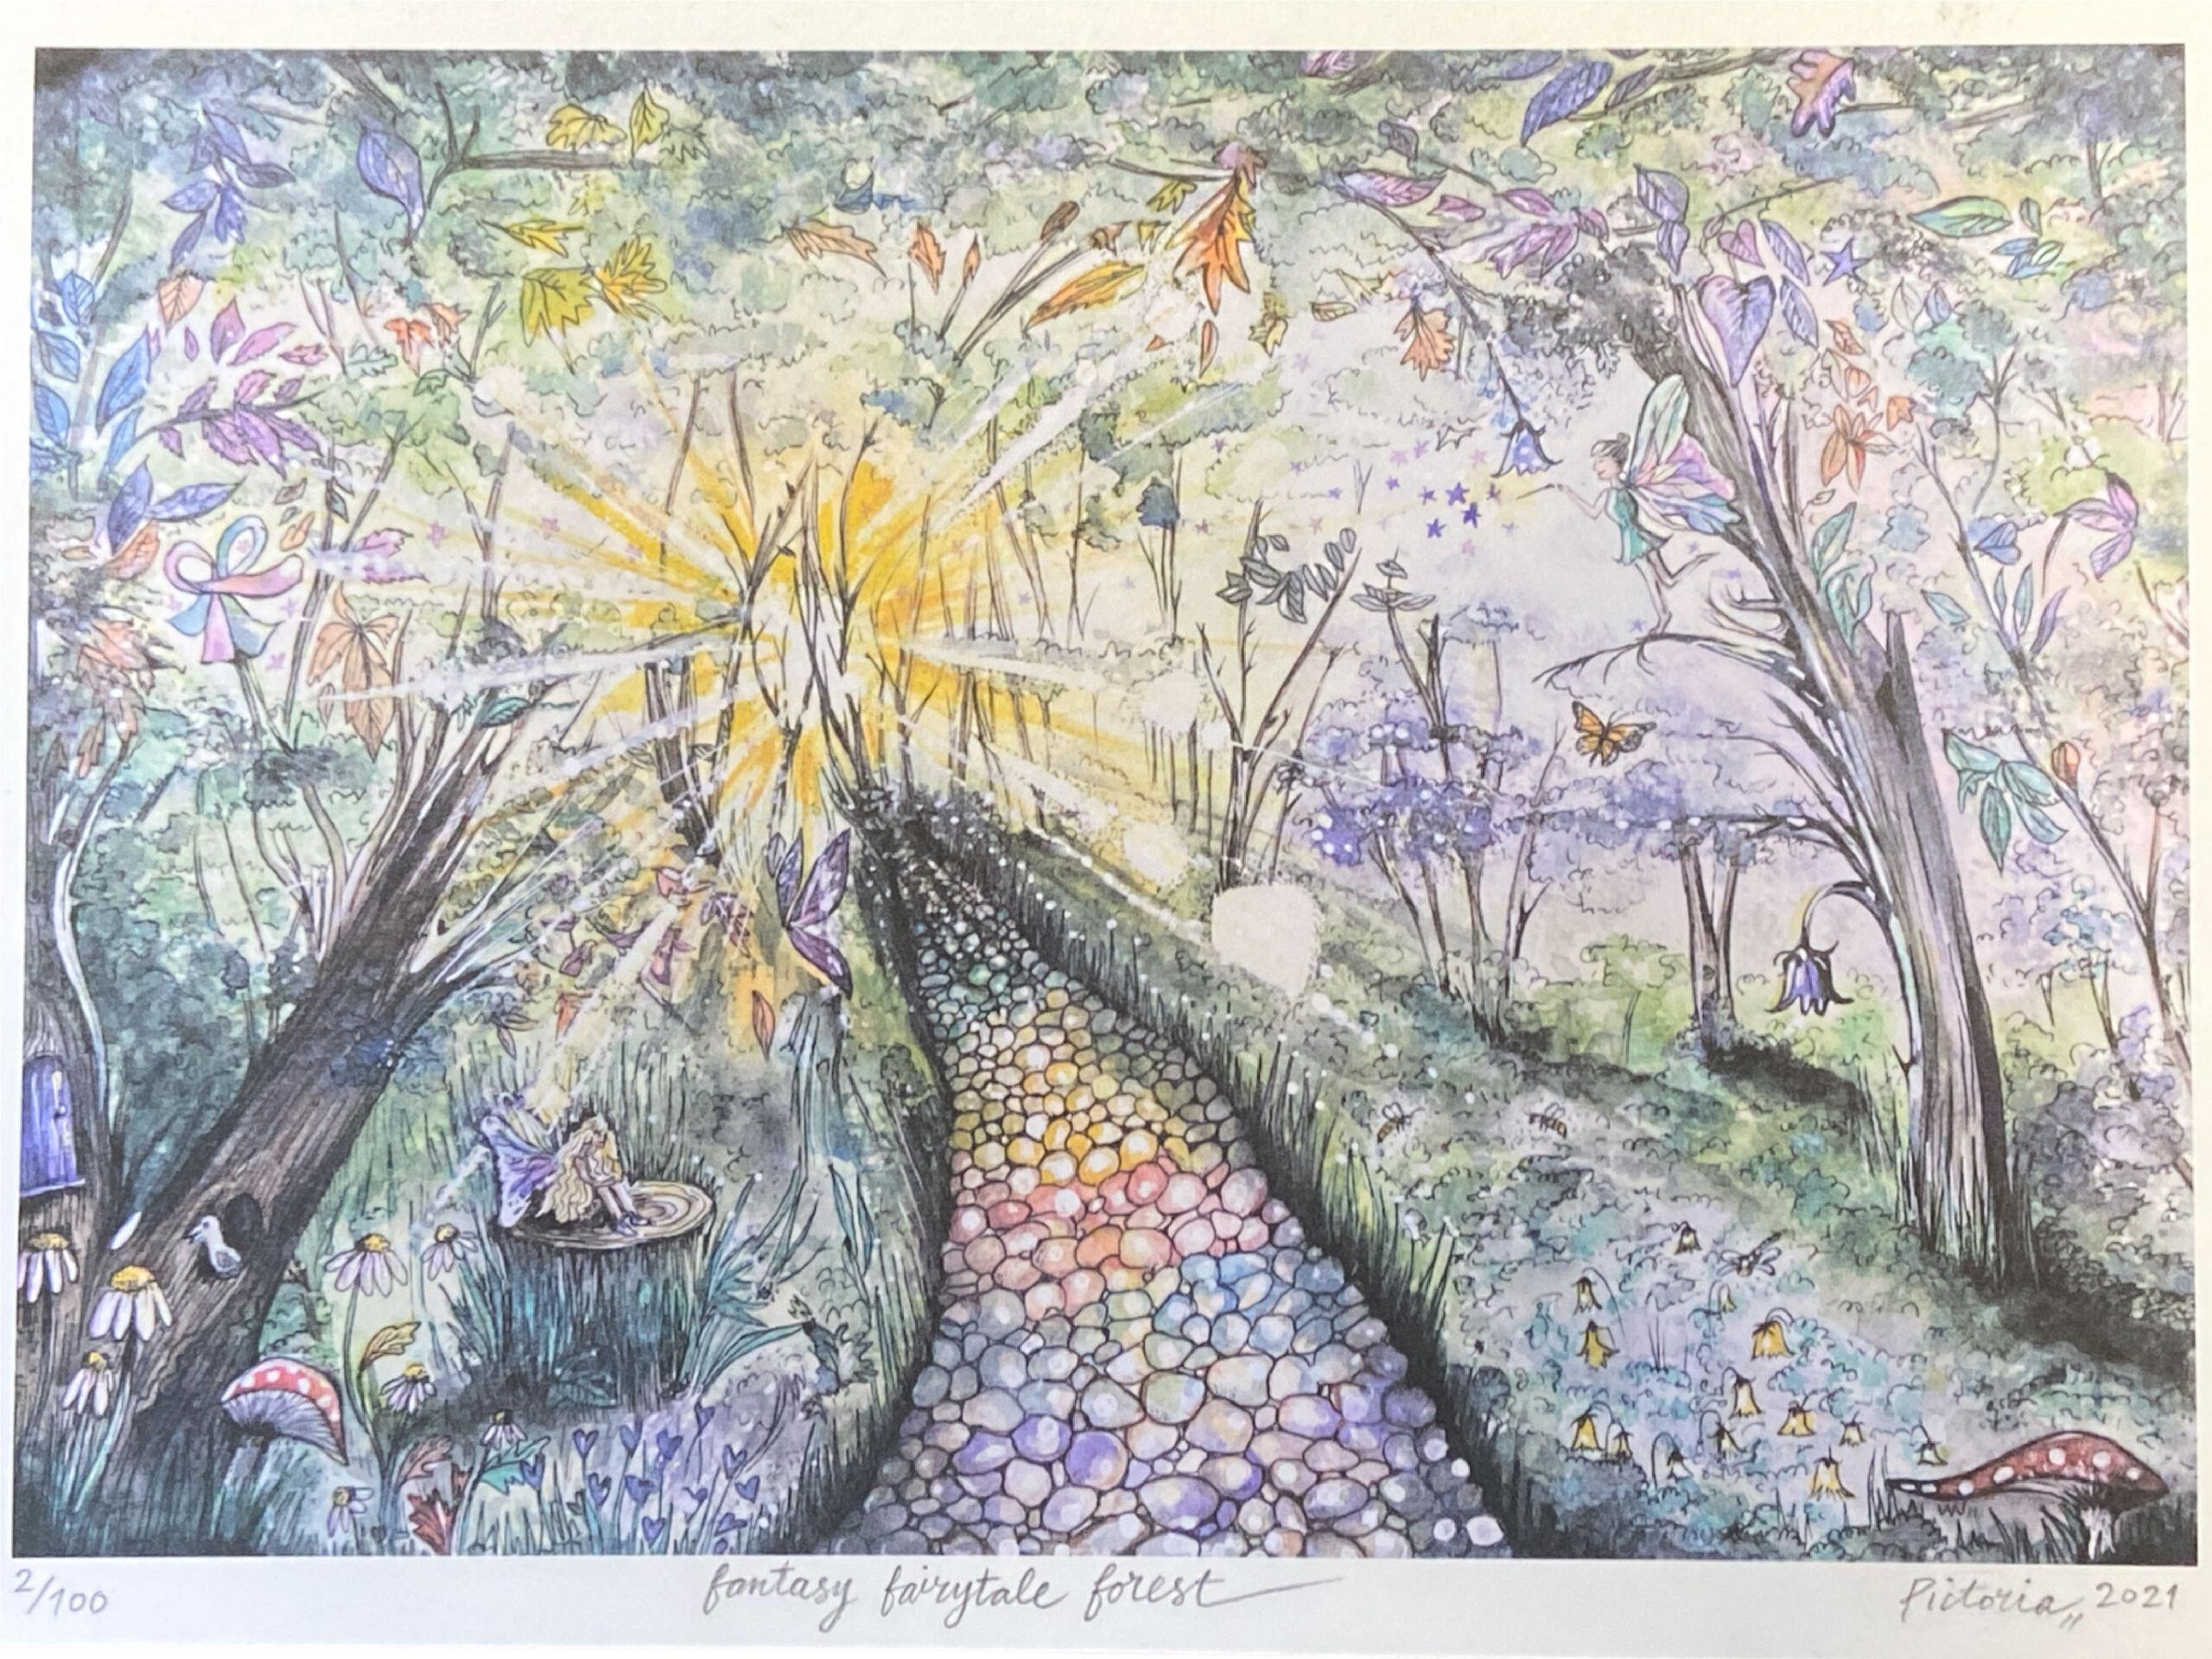 Fantasy Fairytale Forest Print